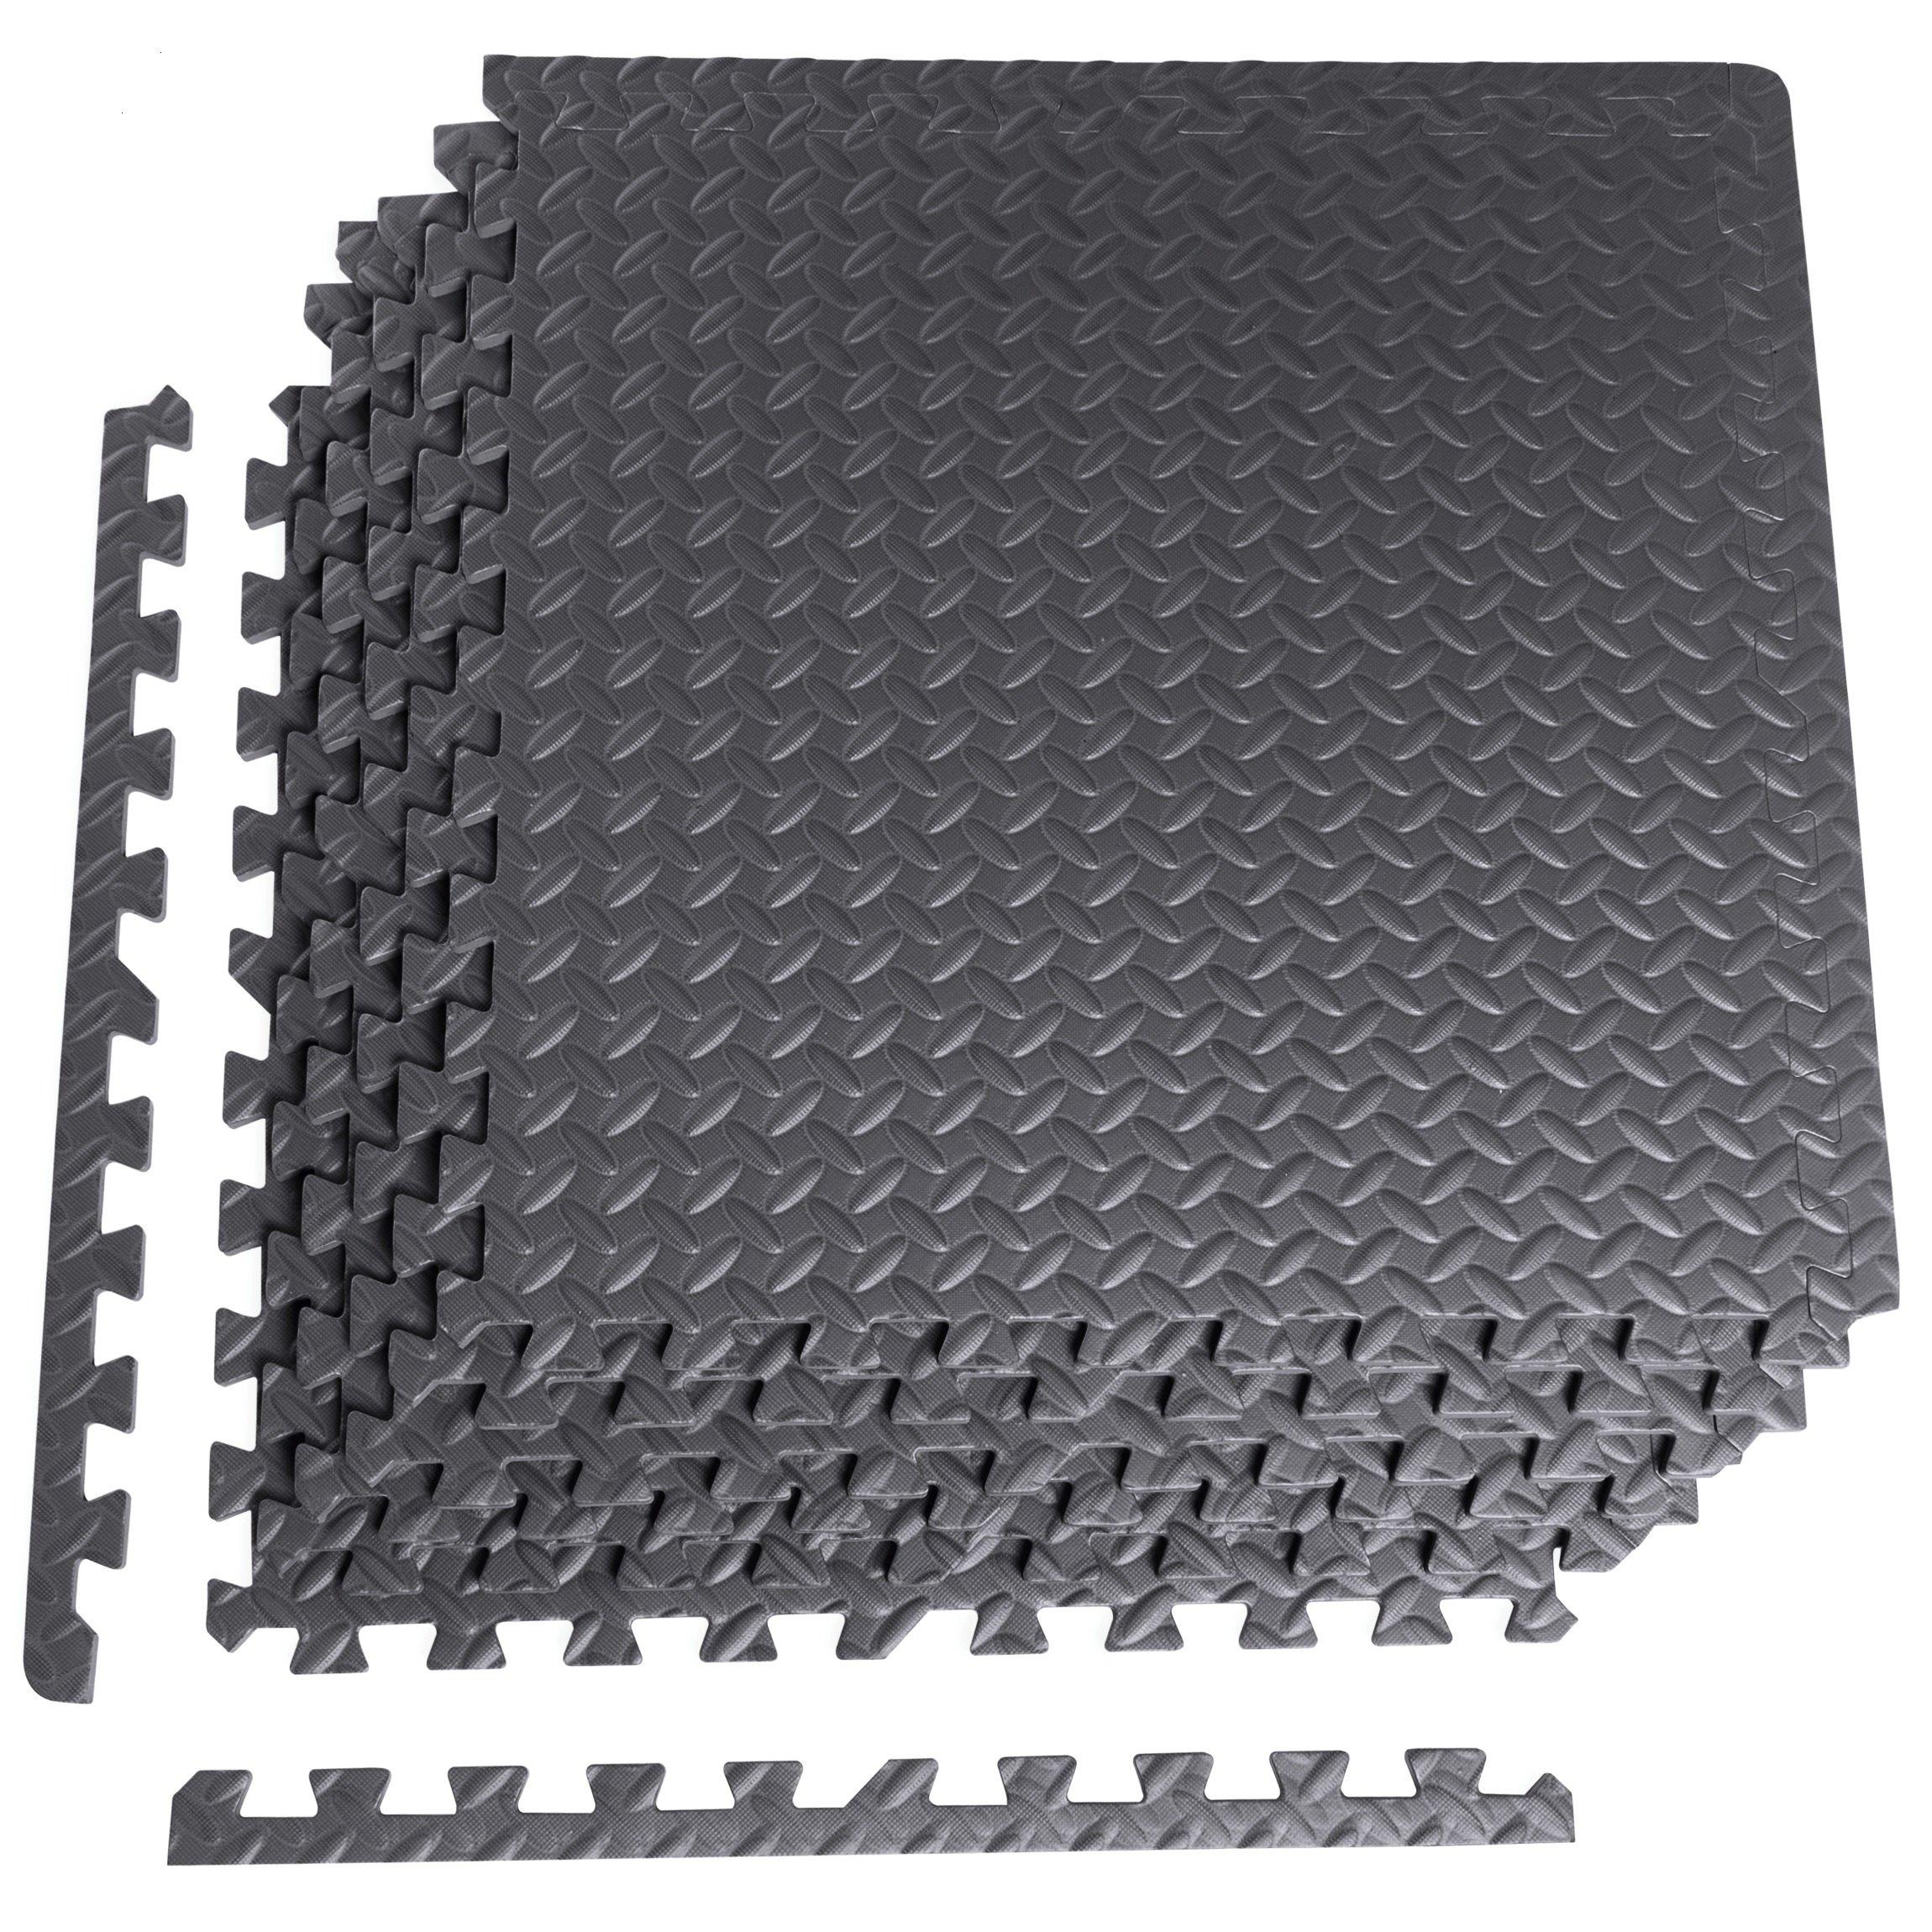 CAP Barbell Puzzle Mat (6 piece)